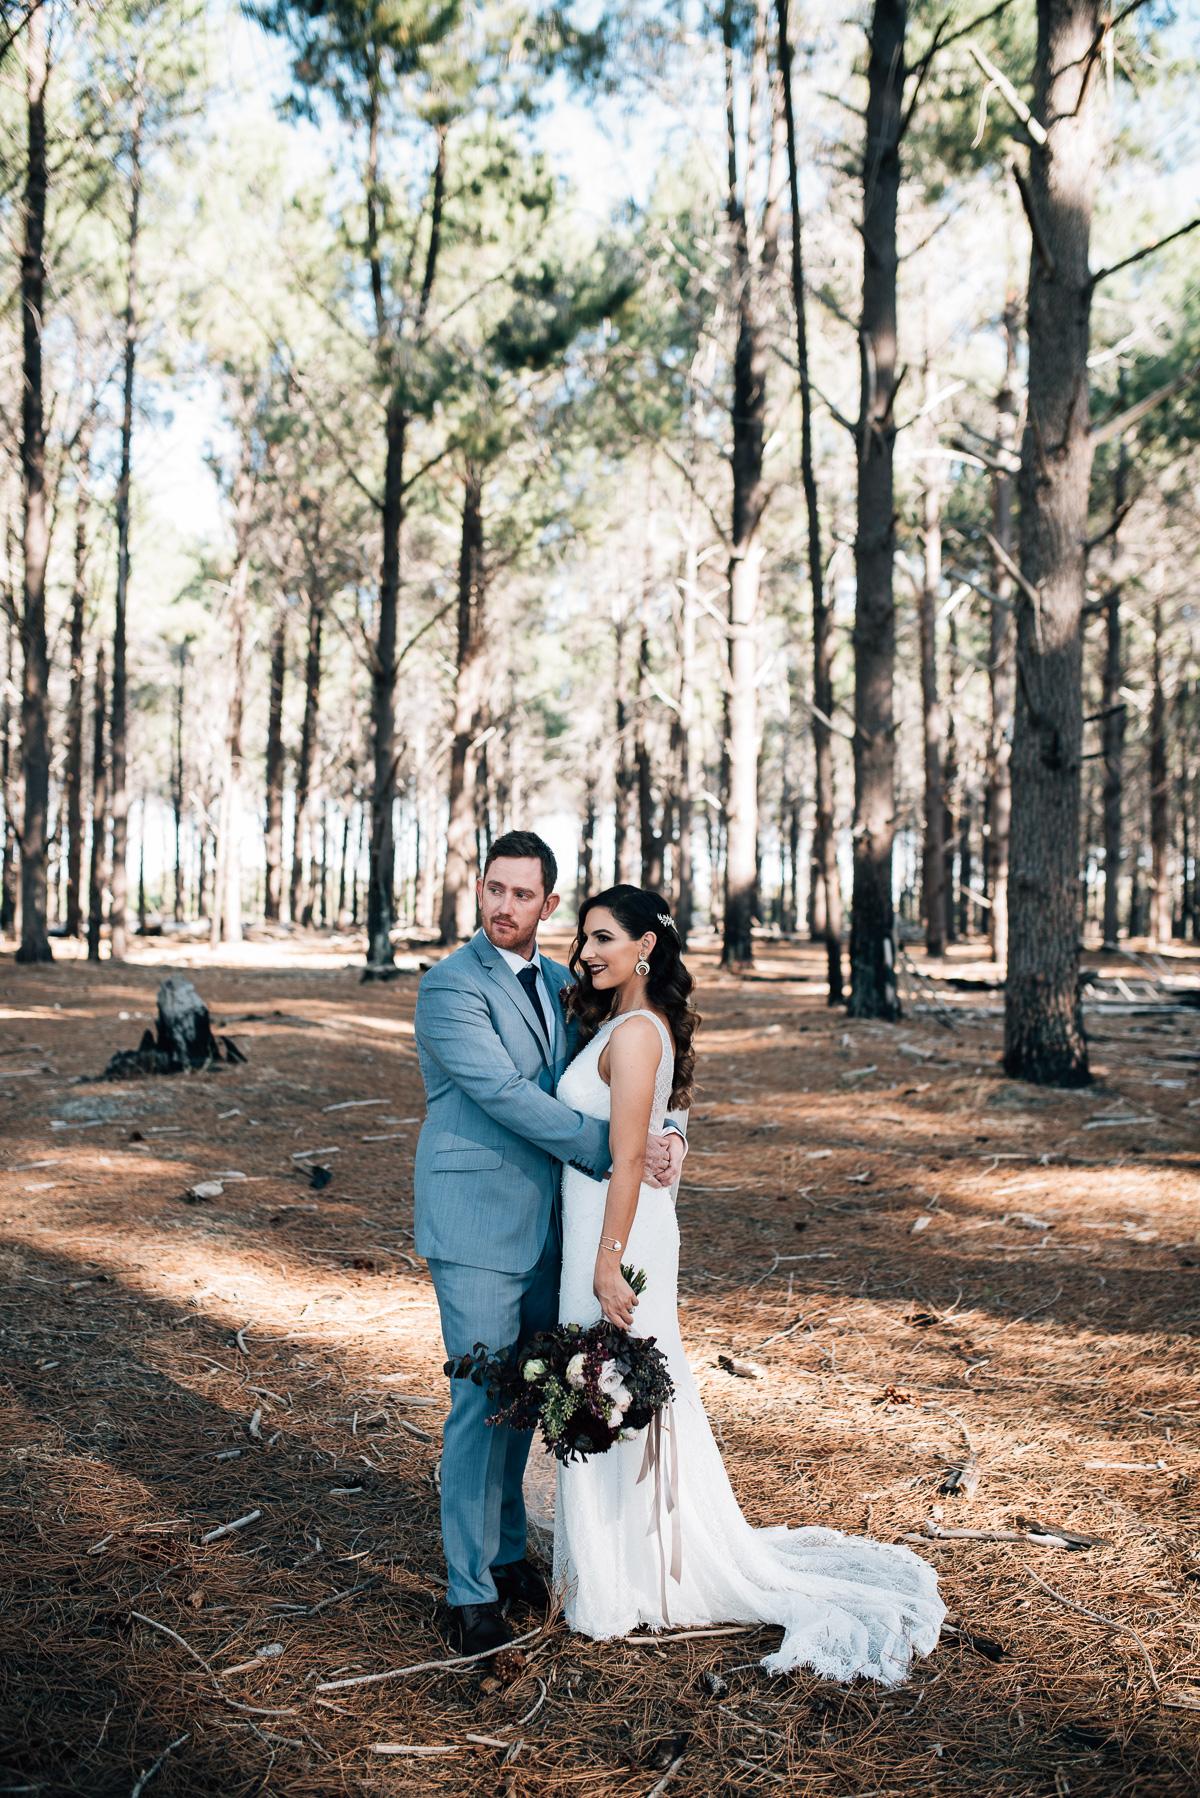 Peggy Saas-Perth Wedding Photographer-The Flour Factory Wedding-73.jpg